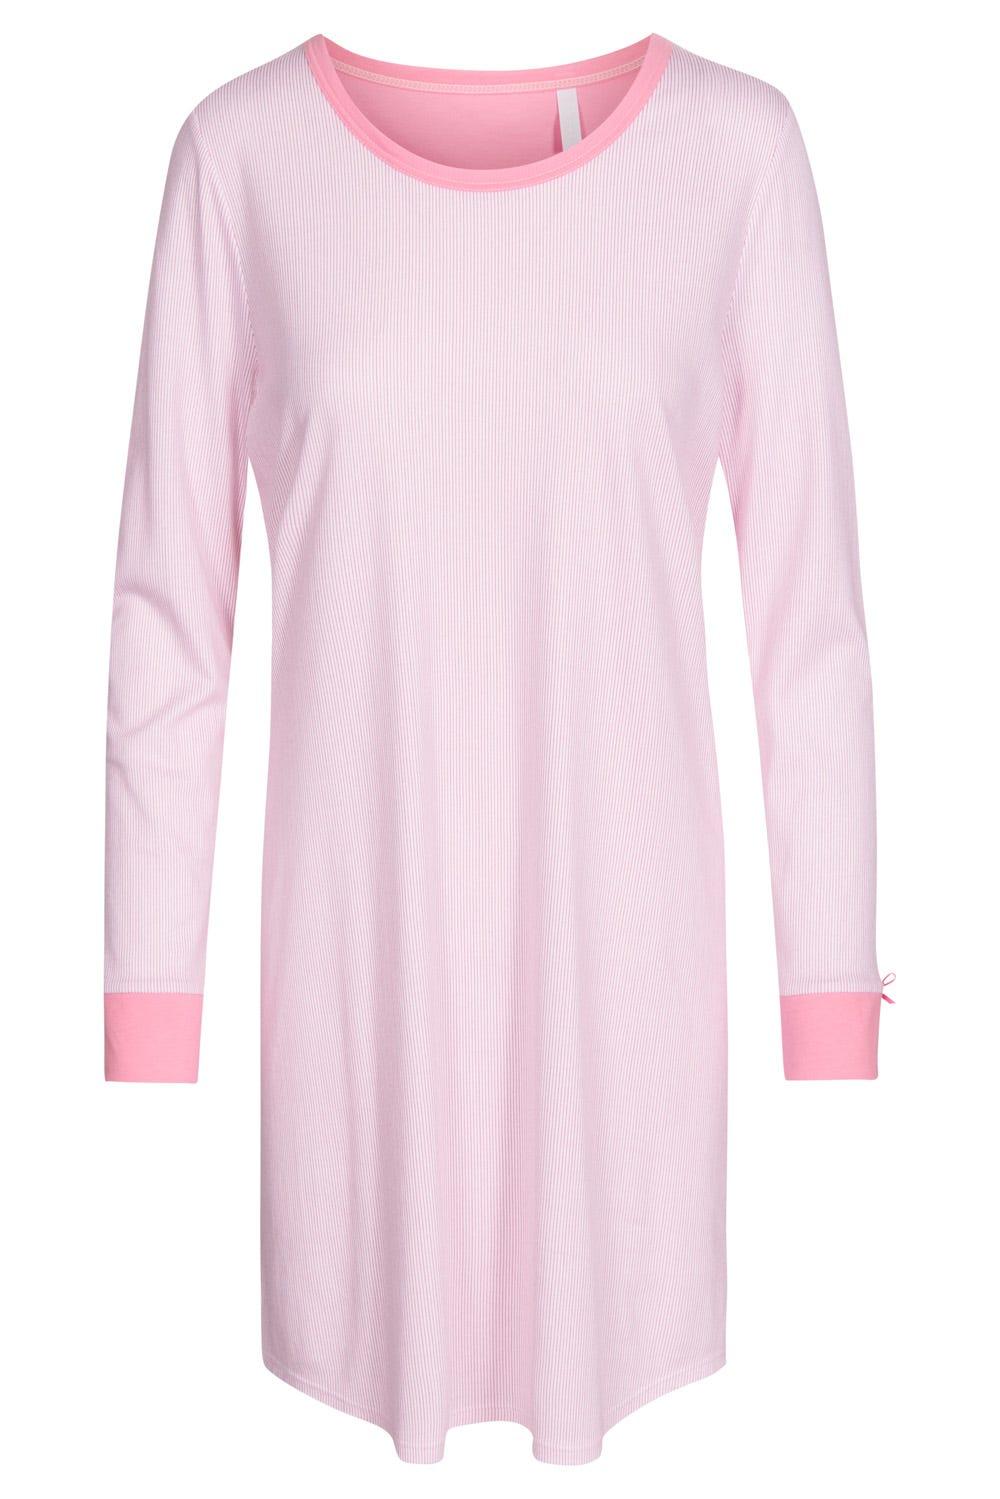 Basic Bigshirt mit Ärmelbündchenc1652246